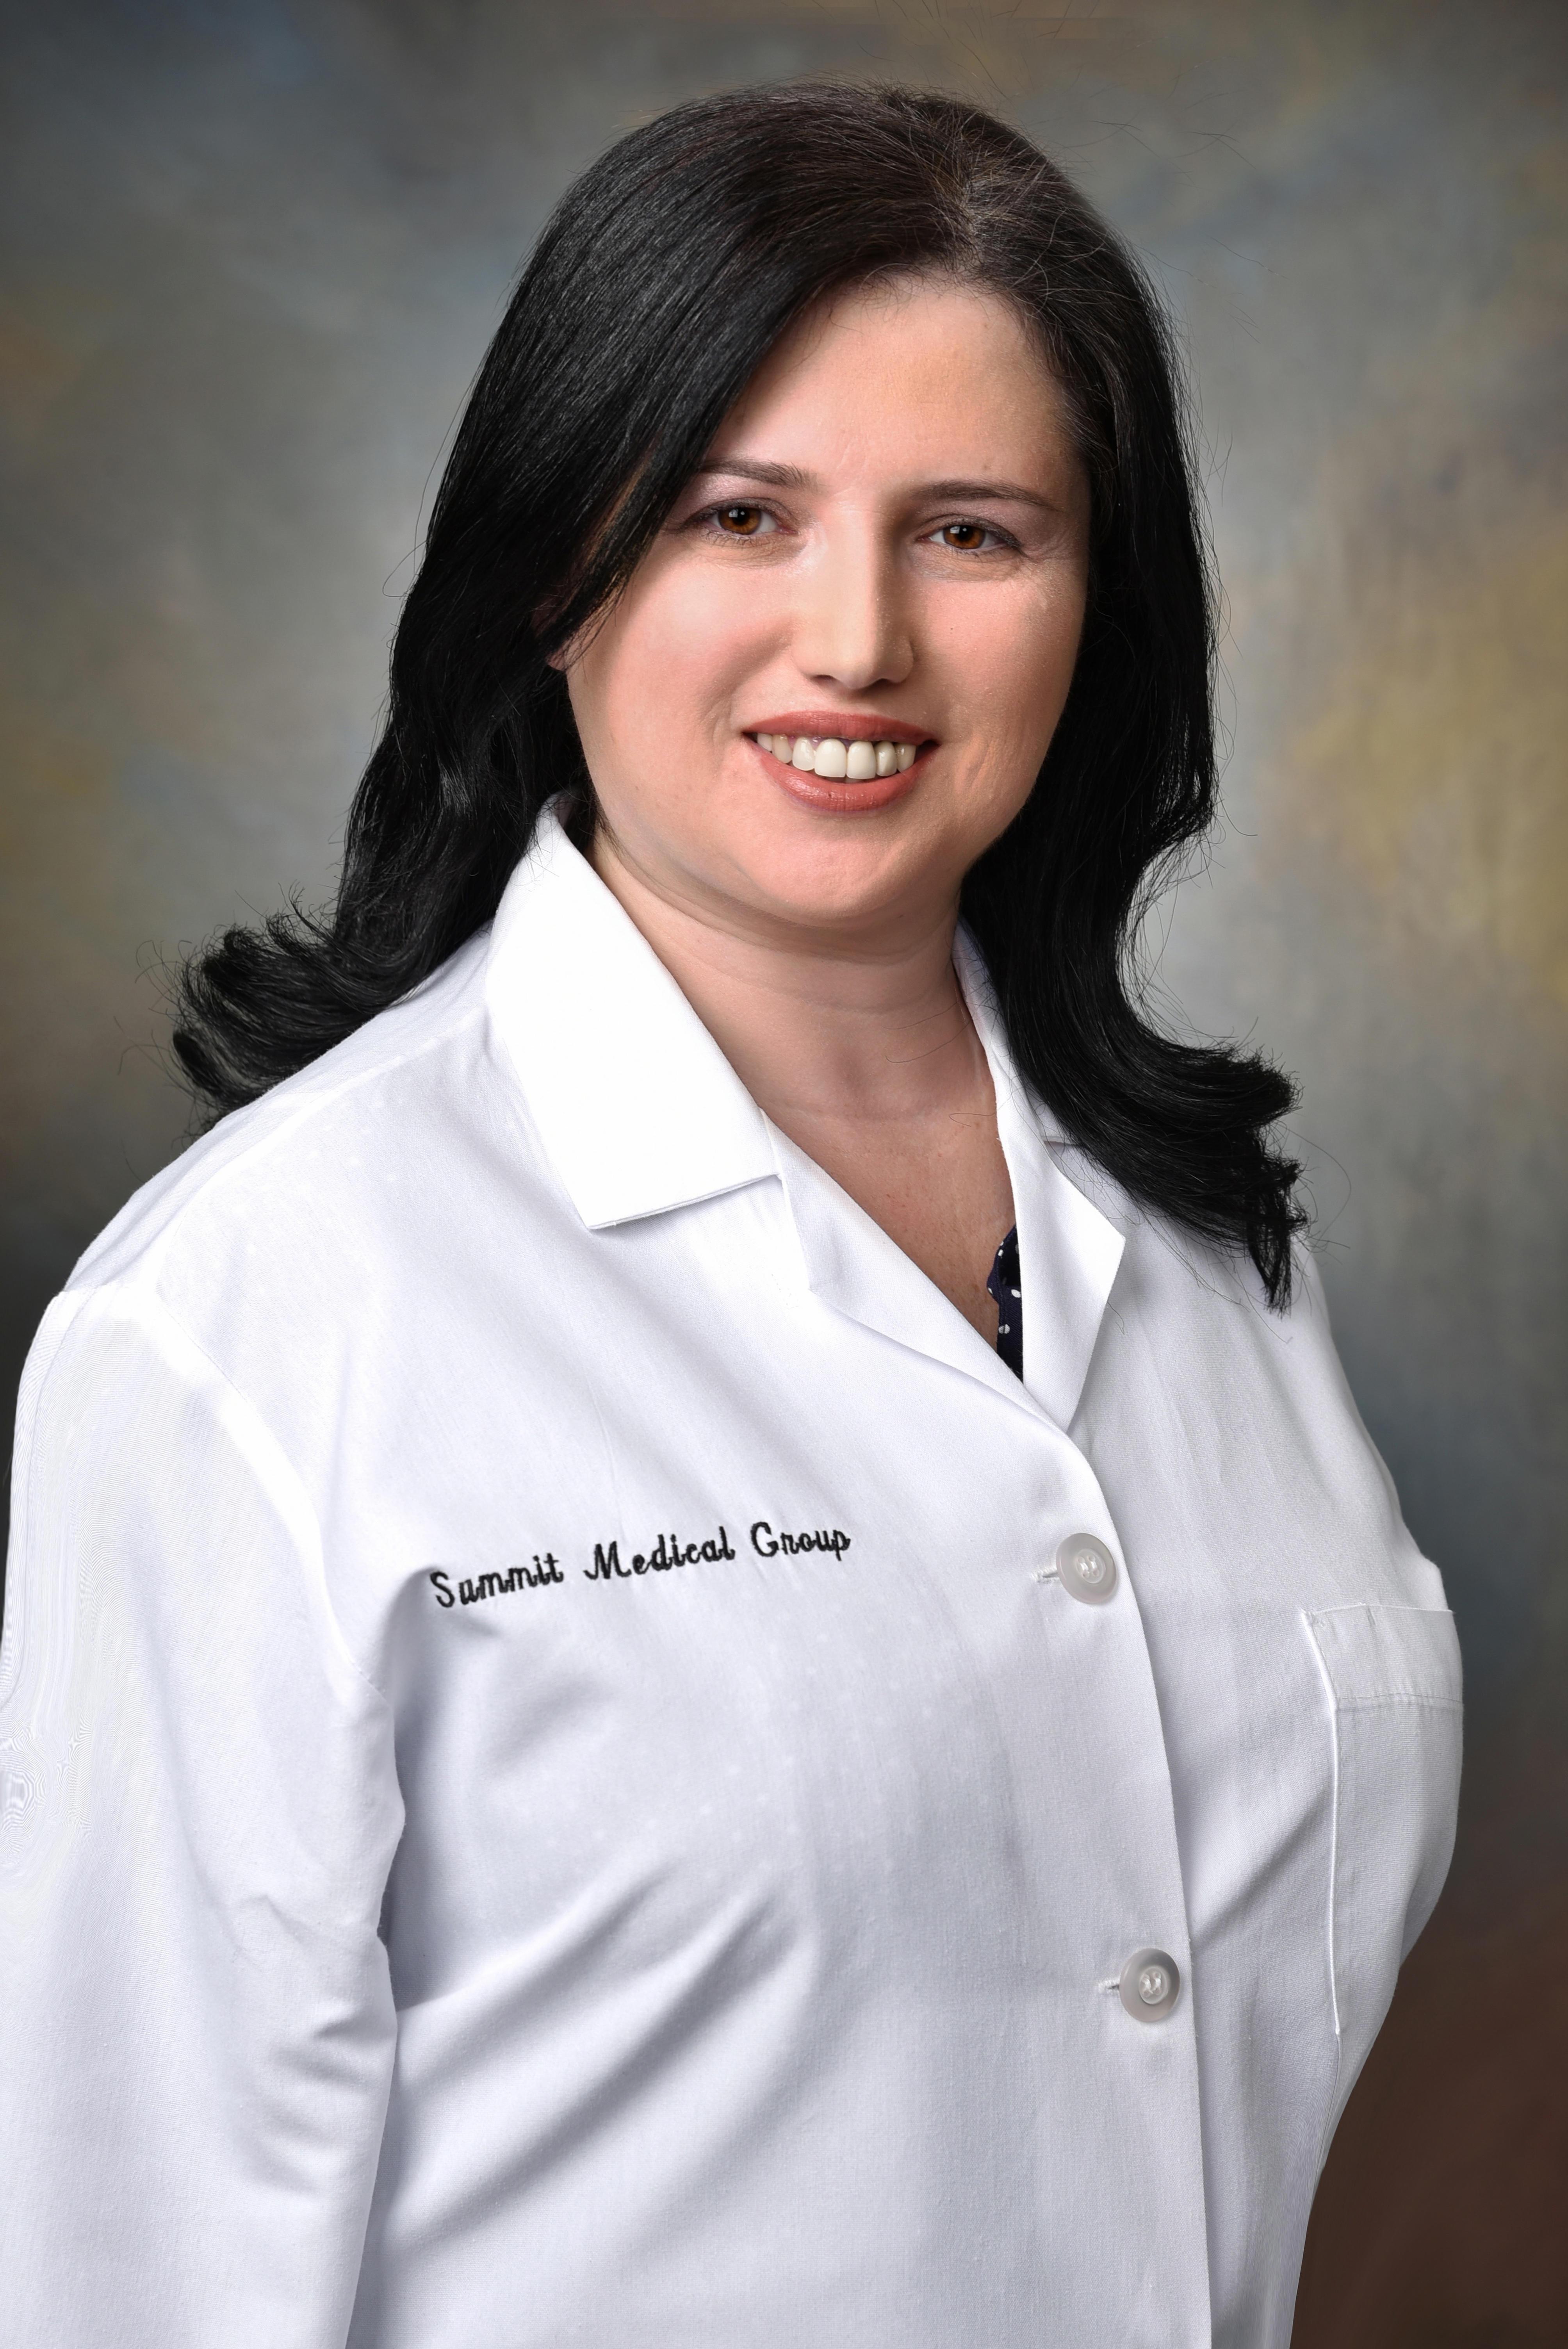 Marianna Strakhan, MD